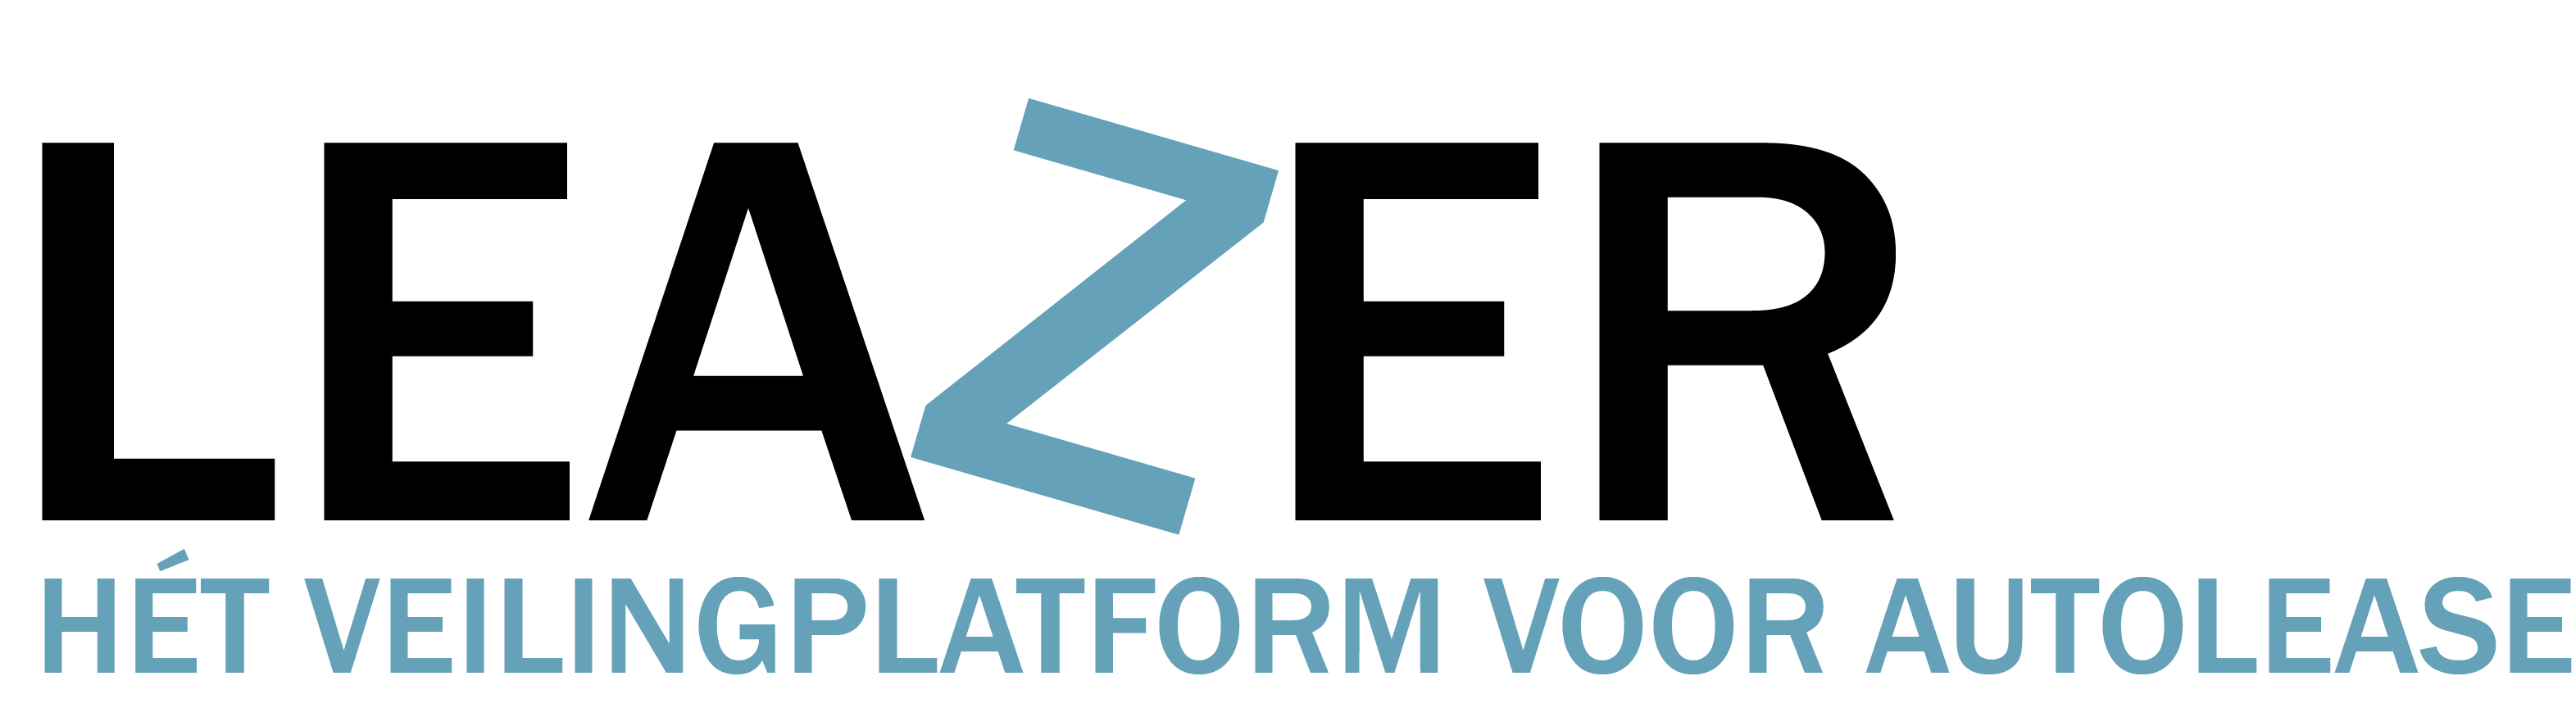 leaZer veilingplatform2